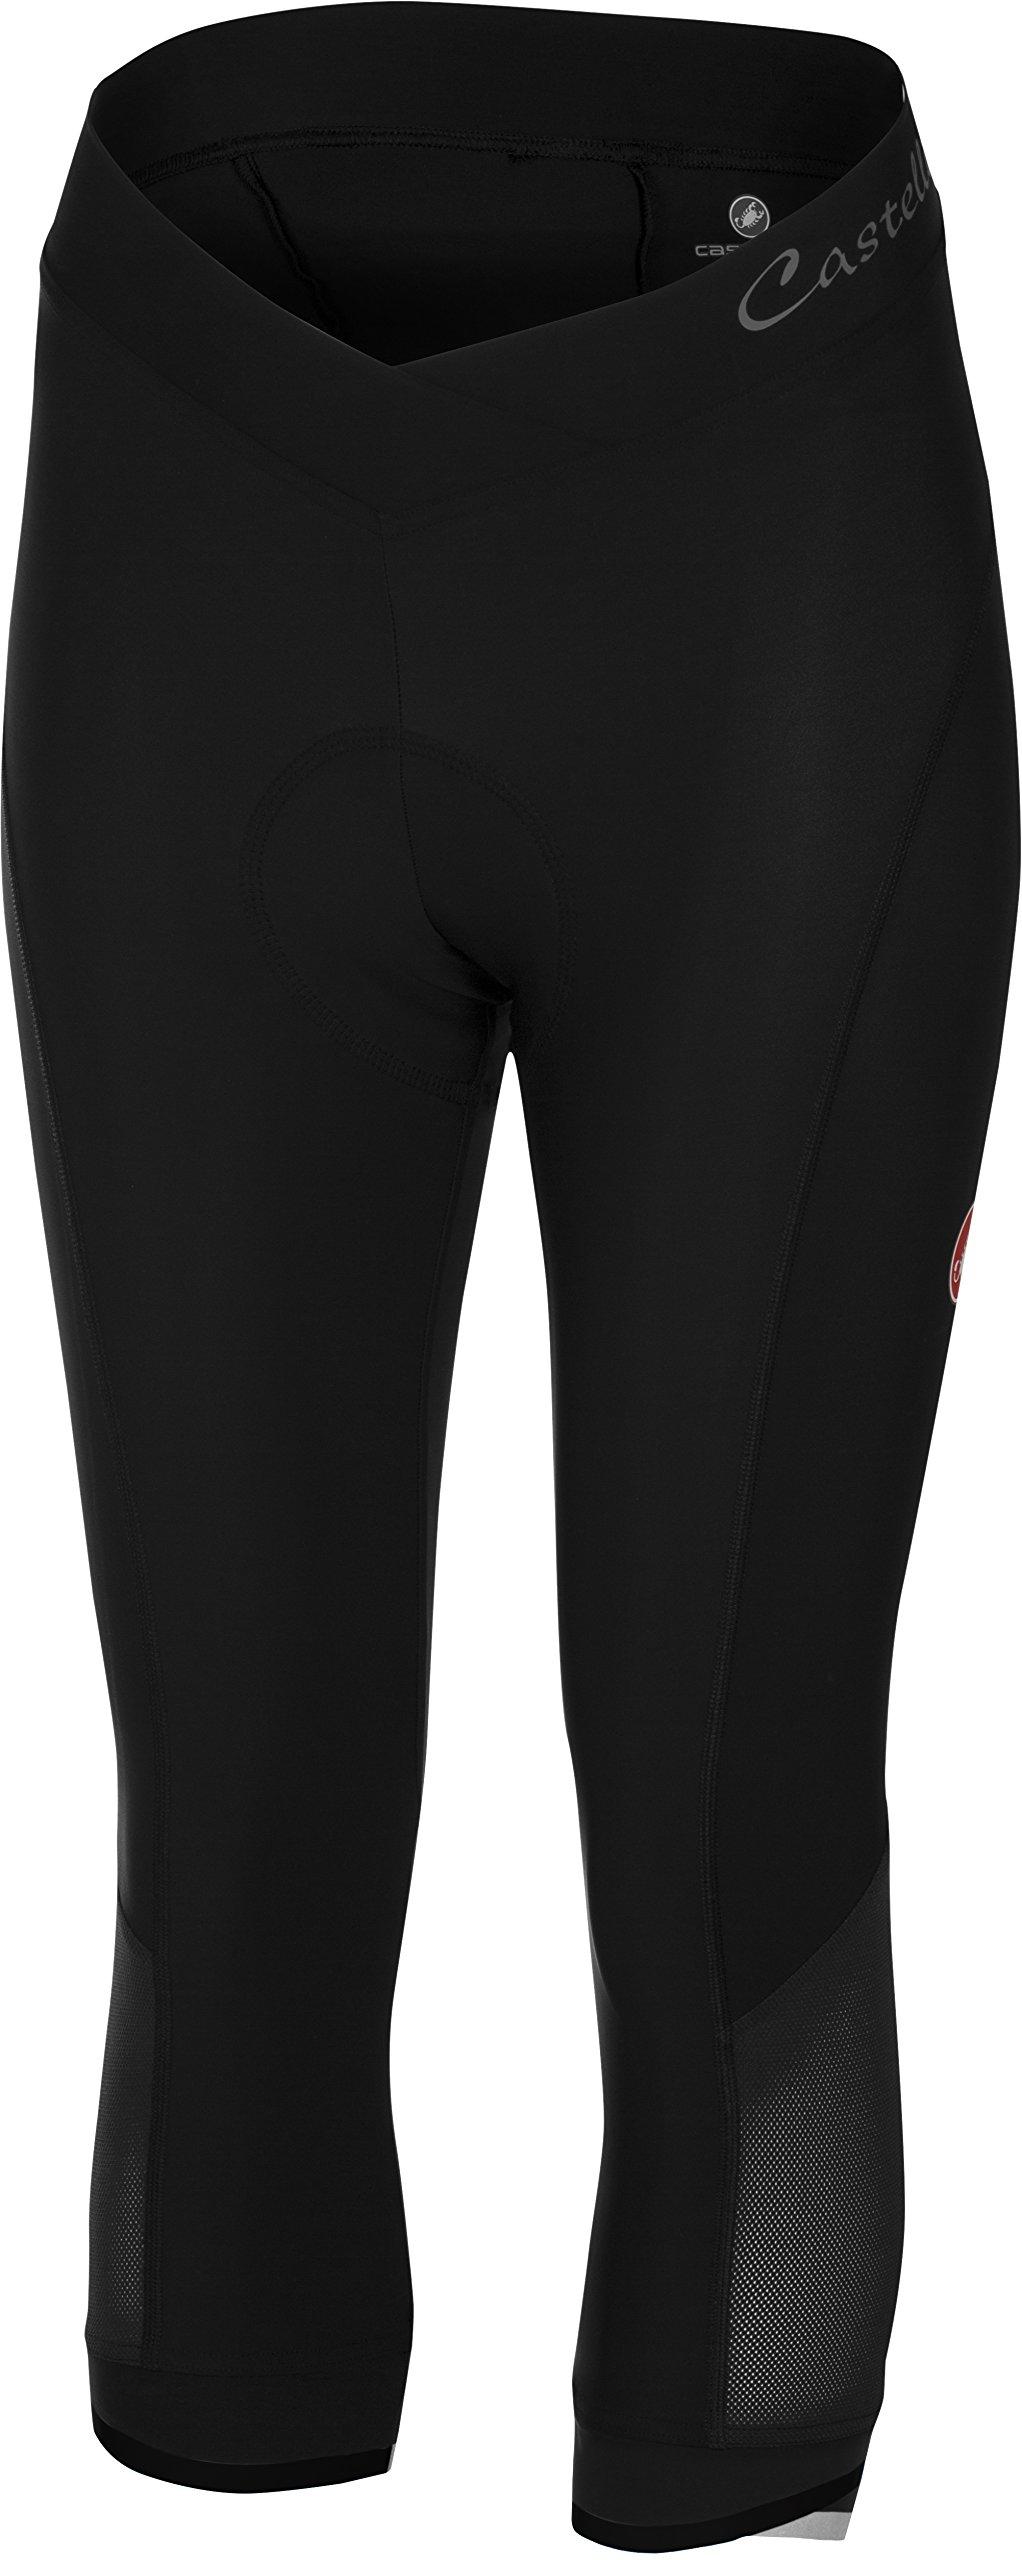 Castelli Vista Knicker - Women's Black, XL by Castelli (Image #1)